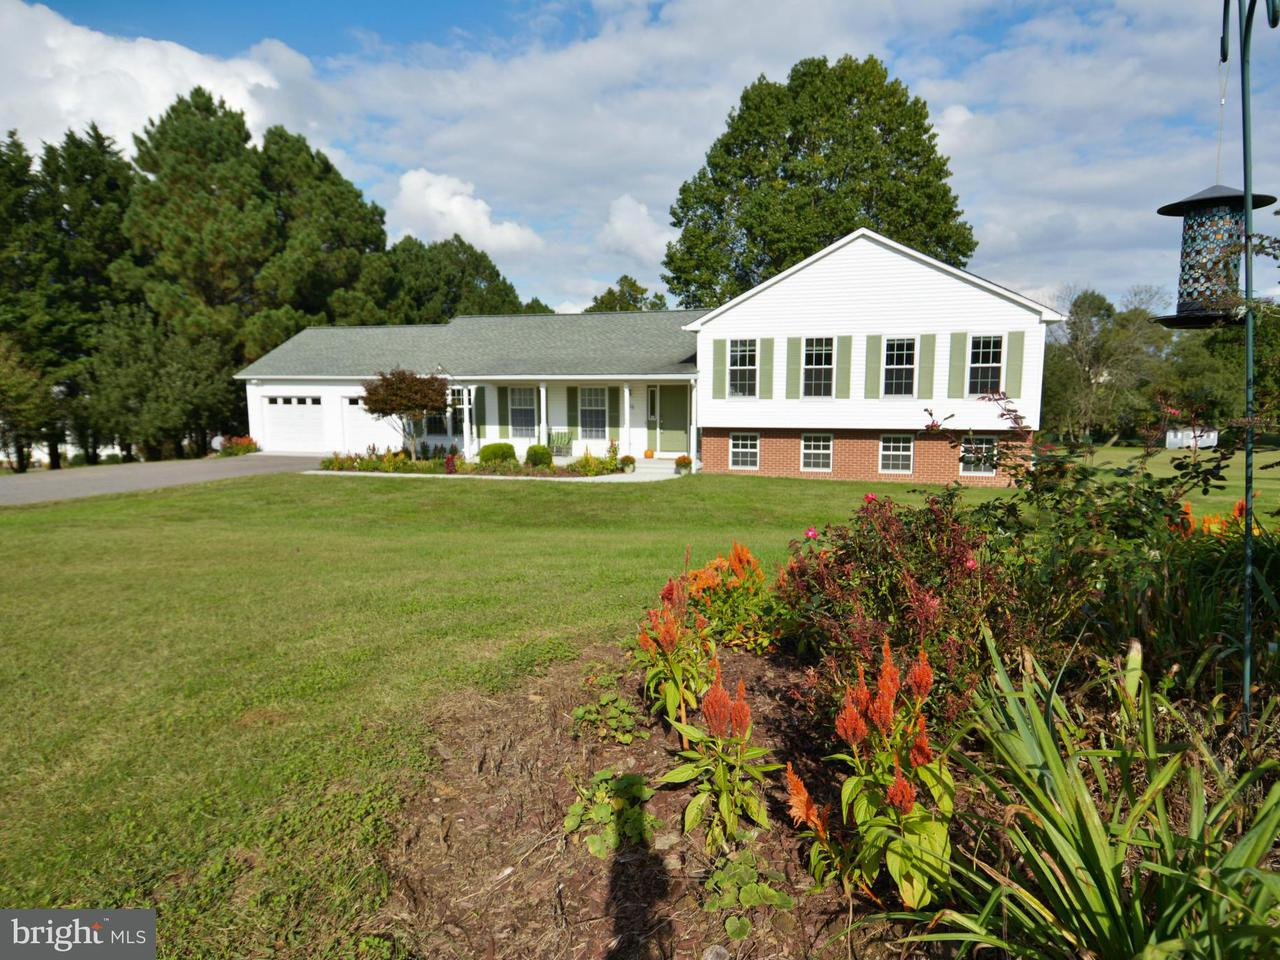 獨棟家庭住宅 為 出售 在 3504 CEDARS STABLE Road 3504 CEDARS STABLE Road Harwood, 馬里蘭州 20776 美國